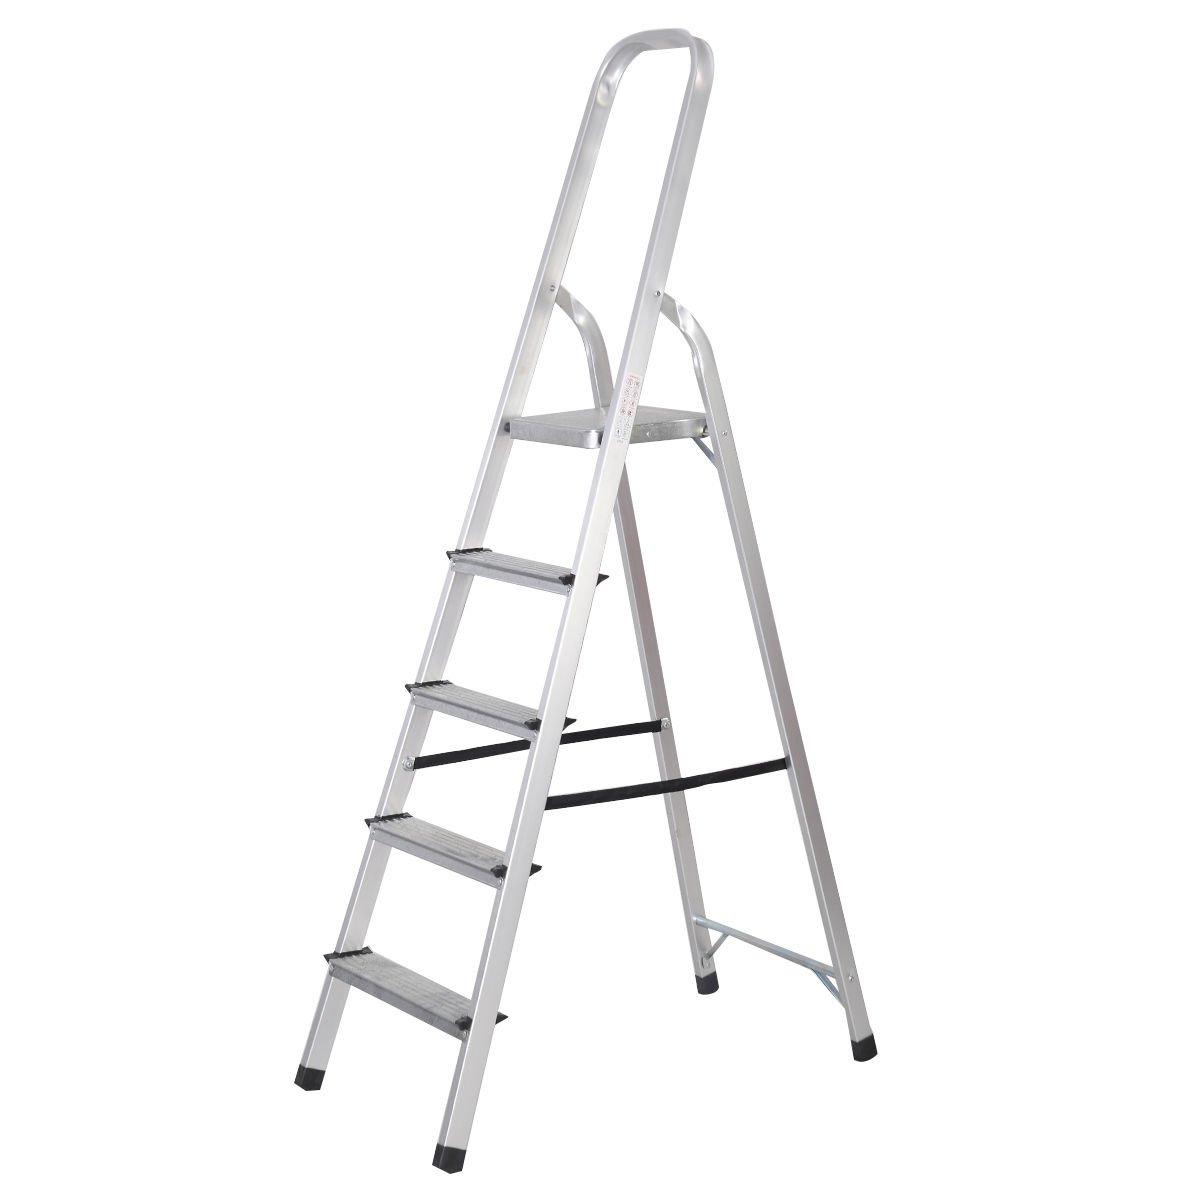 Goplus Foldable 5 Step Ladder Aluminum 6 foot Platform Ladder Non-slip 330 lbs Capacity